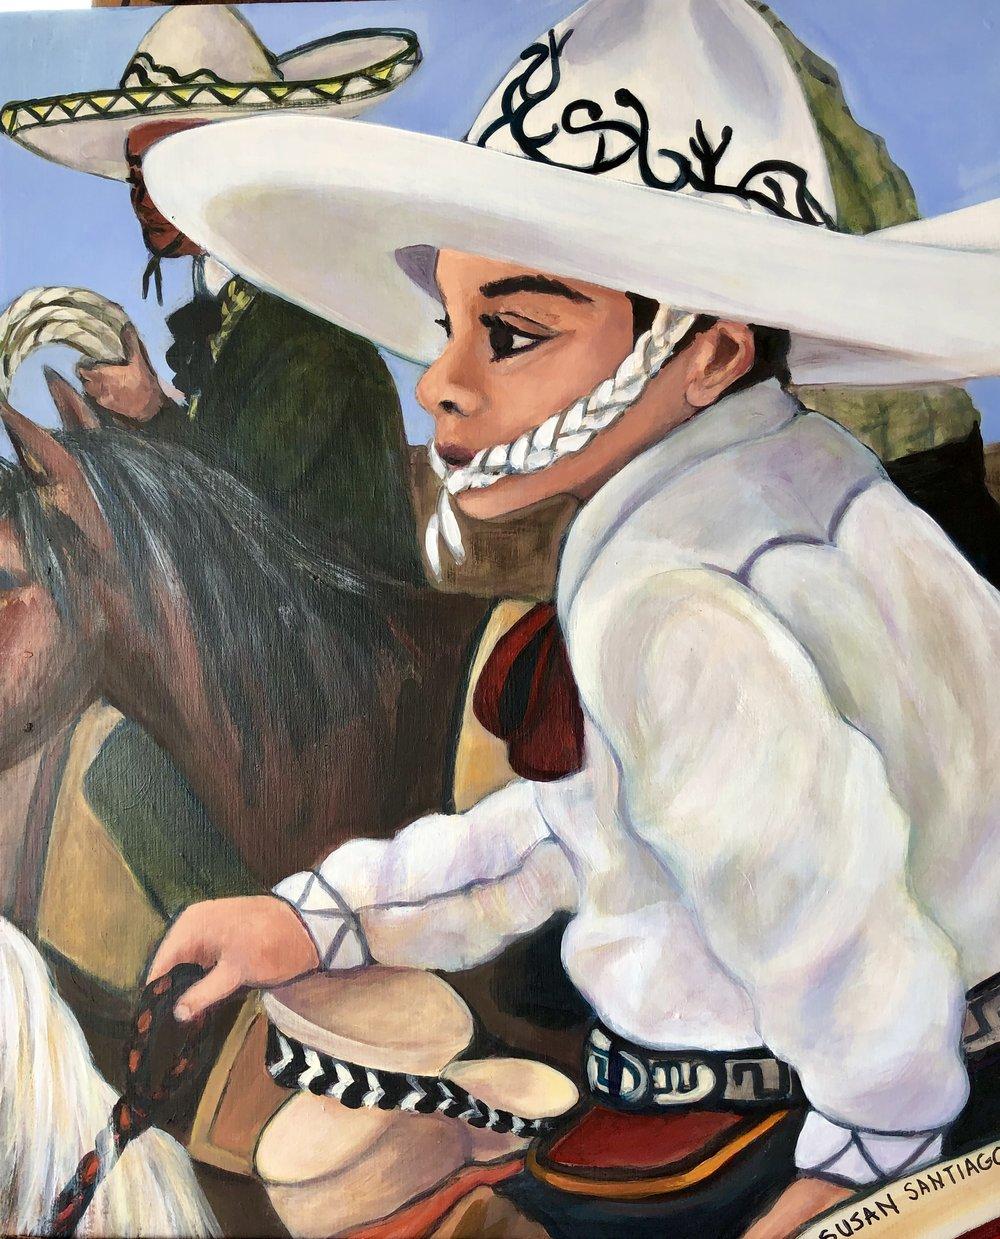 Vaquero - Susan Santiago- Acrylic on Wood Panel 17 inches x 20 $500 USD.jpg